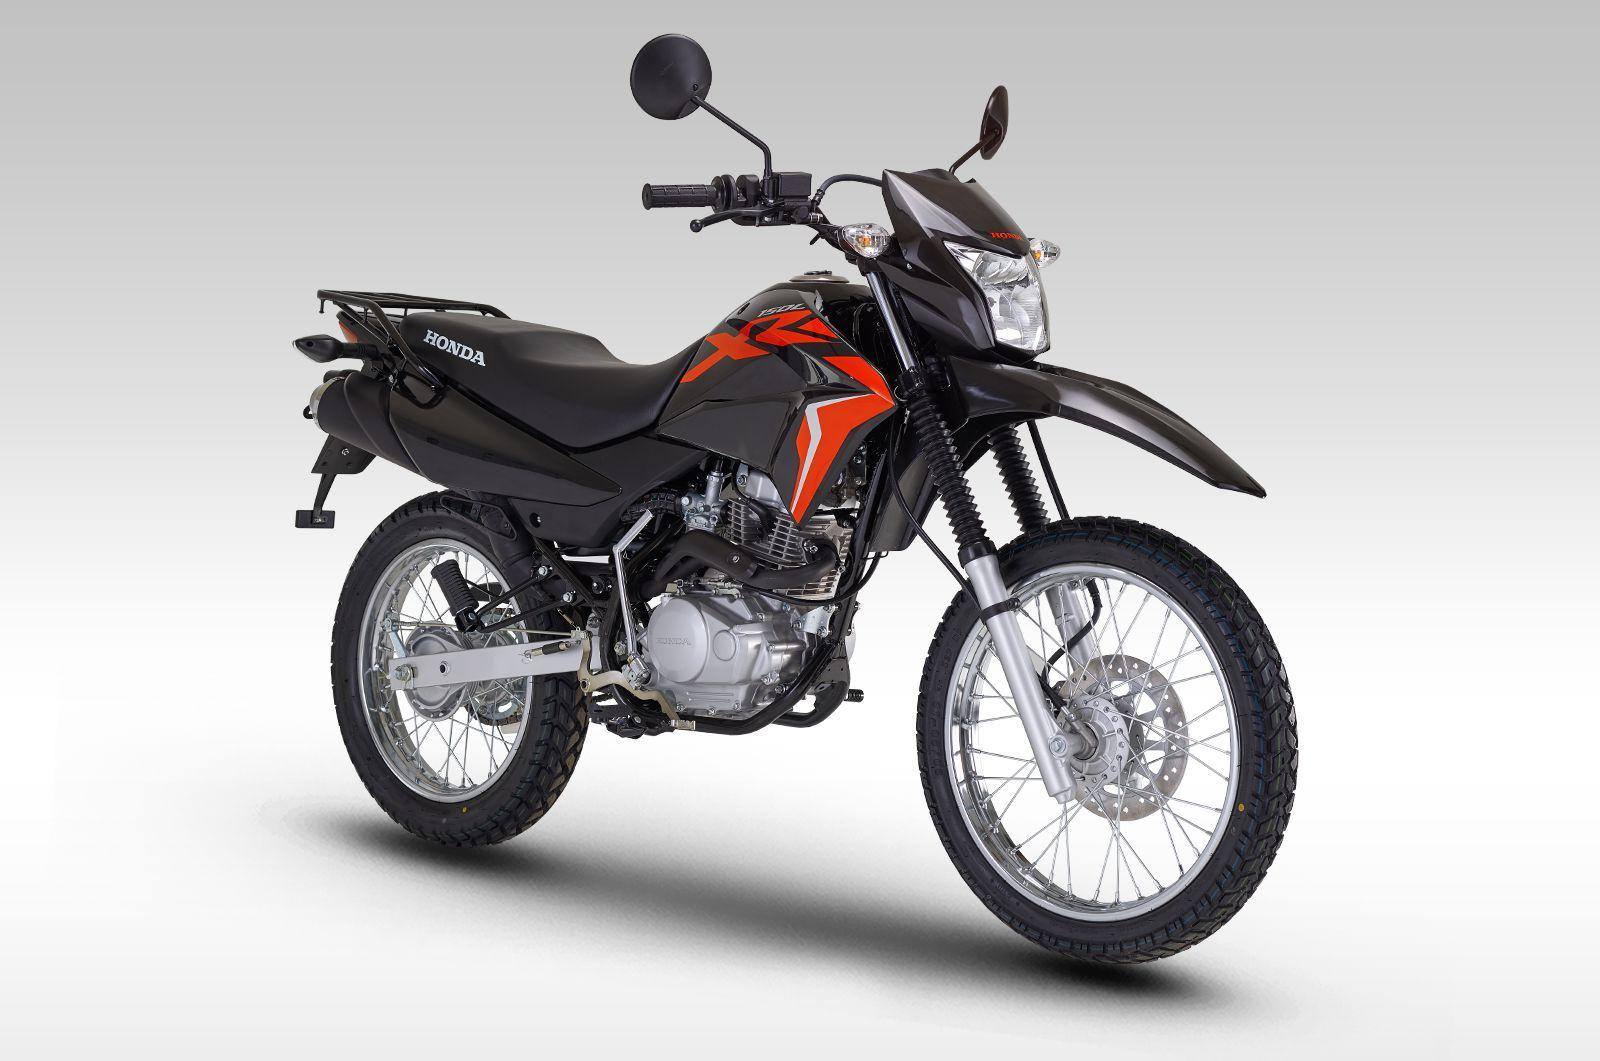 Honda Xr 150 Philippines Review In 2020 Motorcycle Dealer Honda Motocross Love